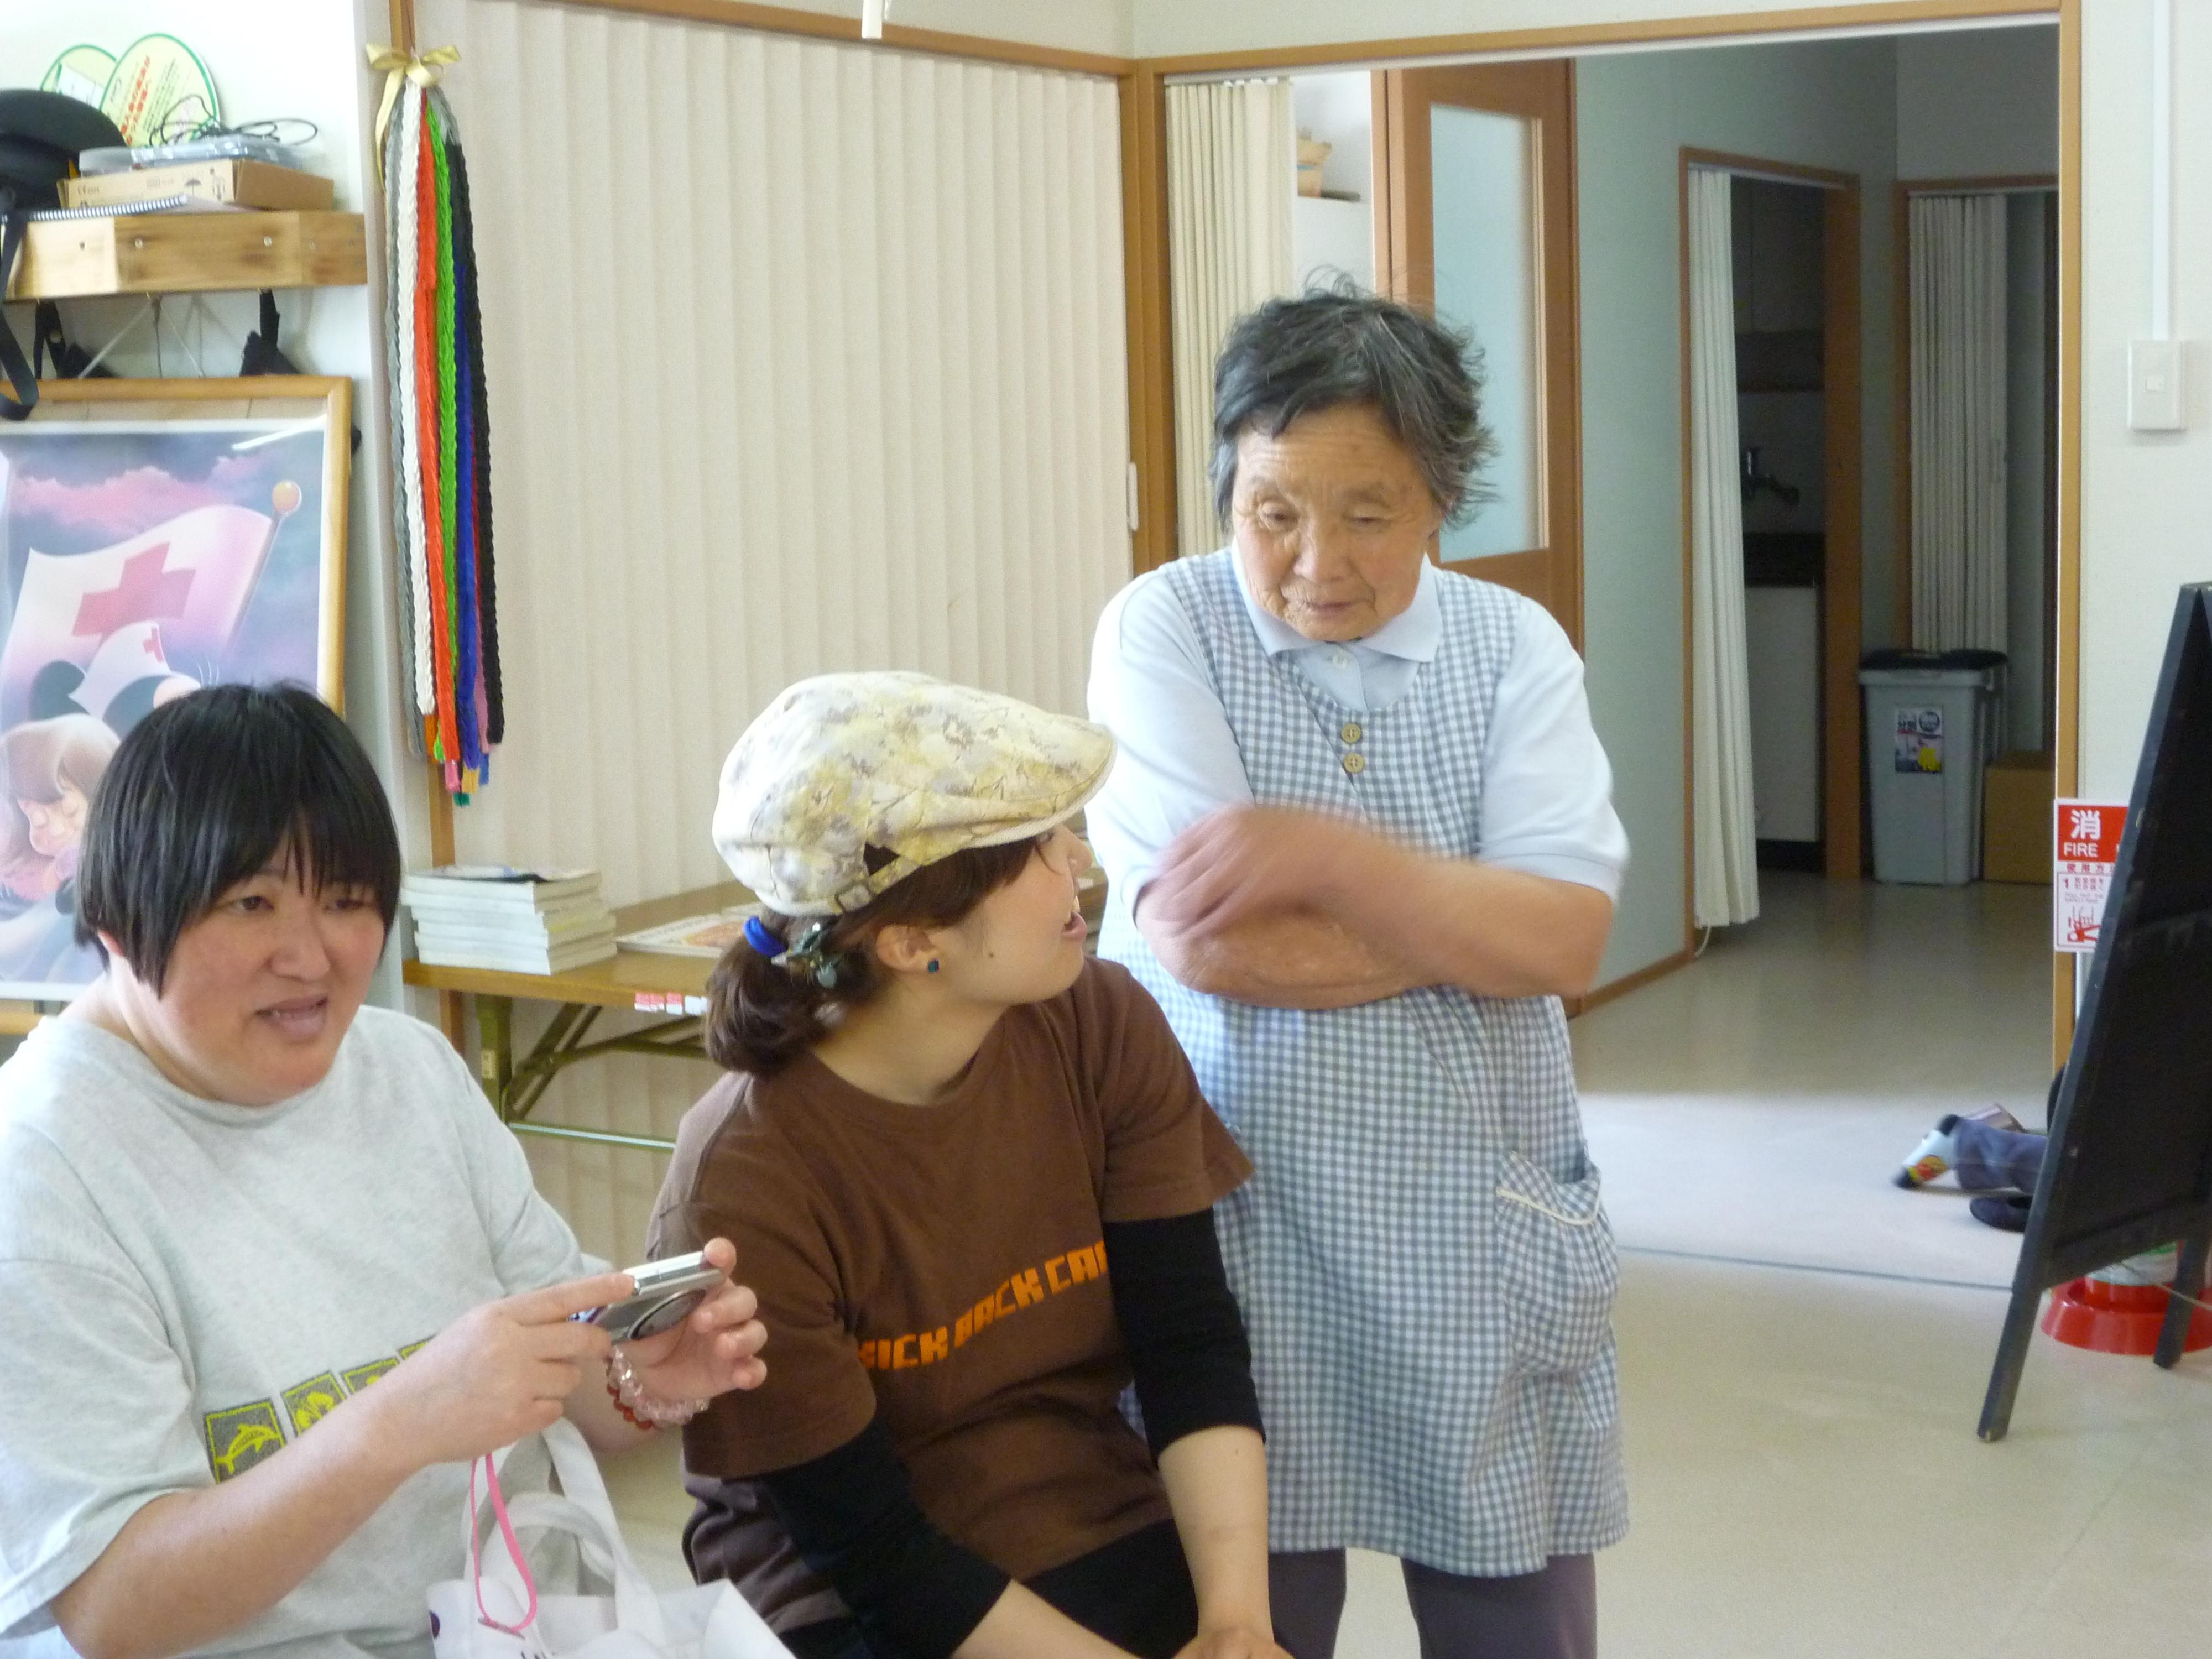 http://www.kickbackcafe.jp/support2/report/P1040820.JPG